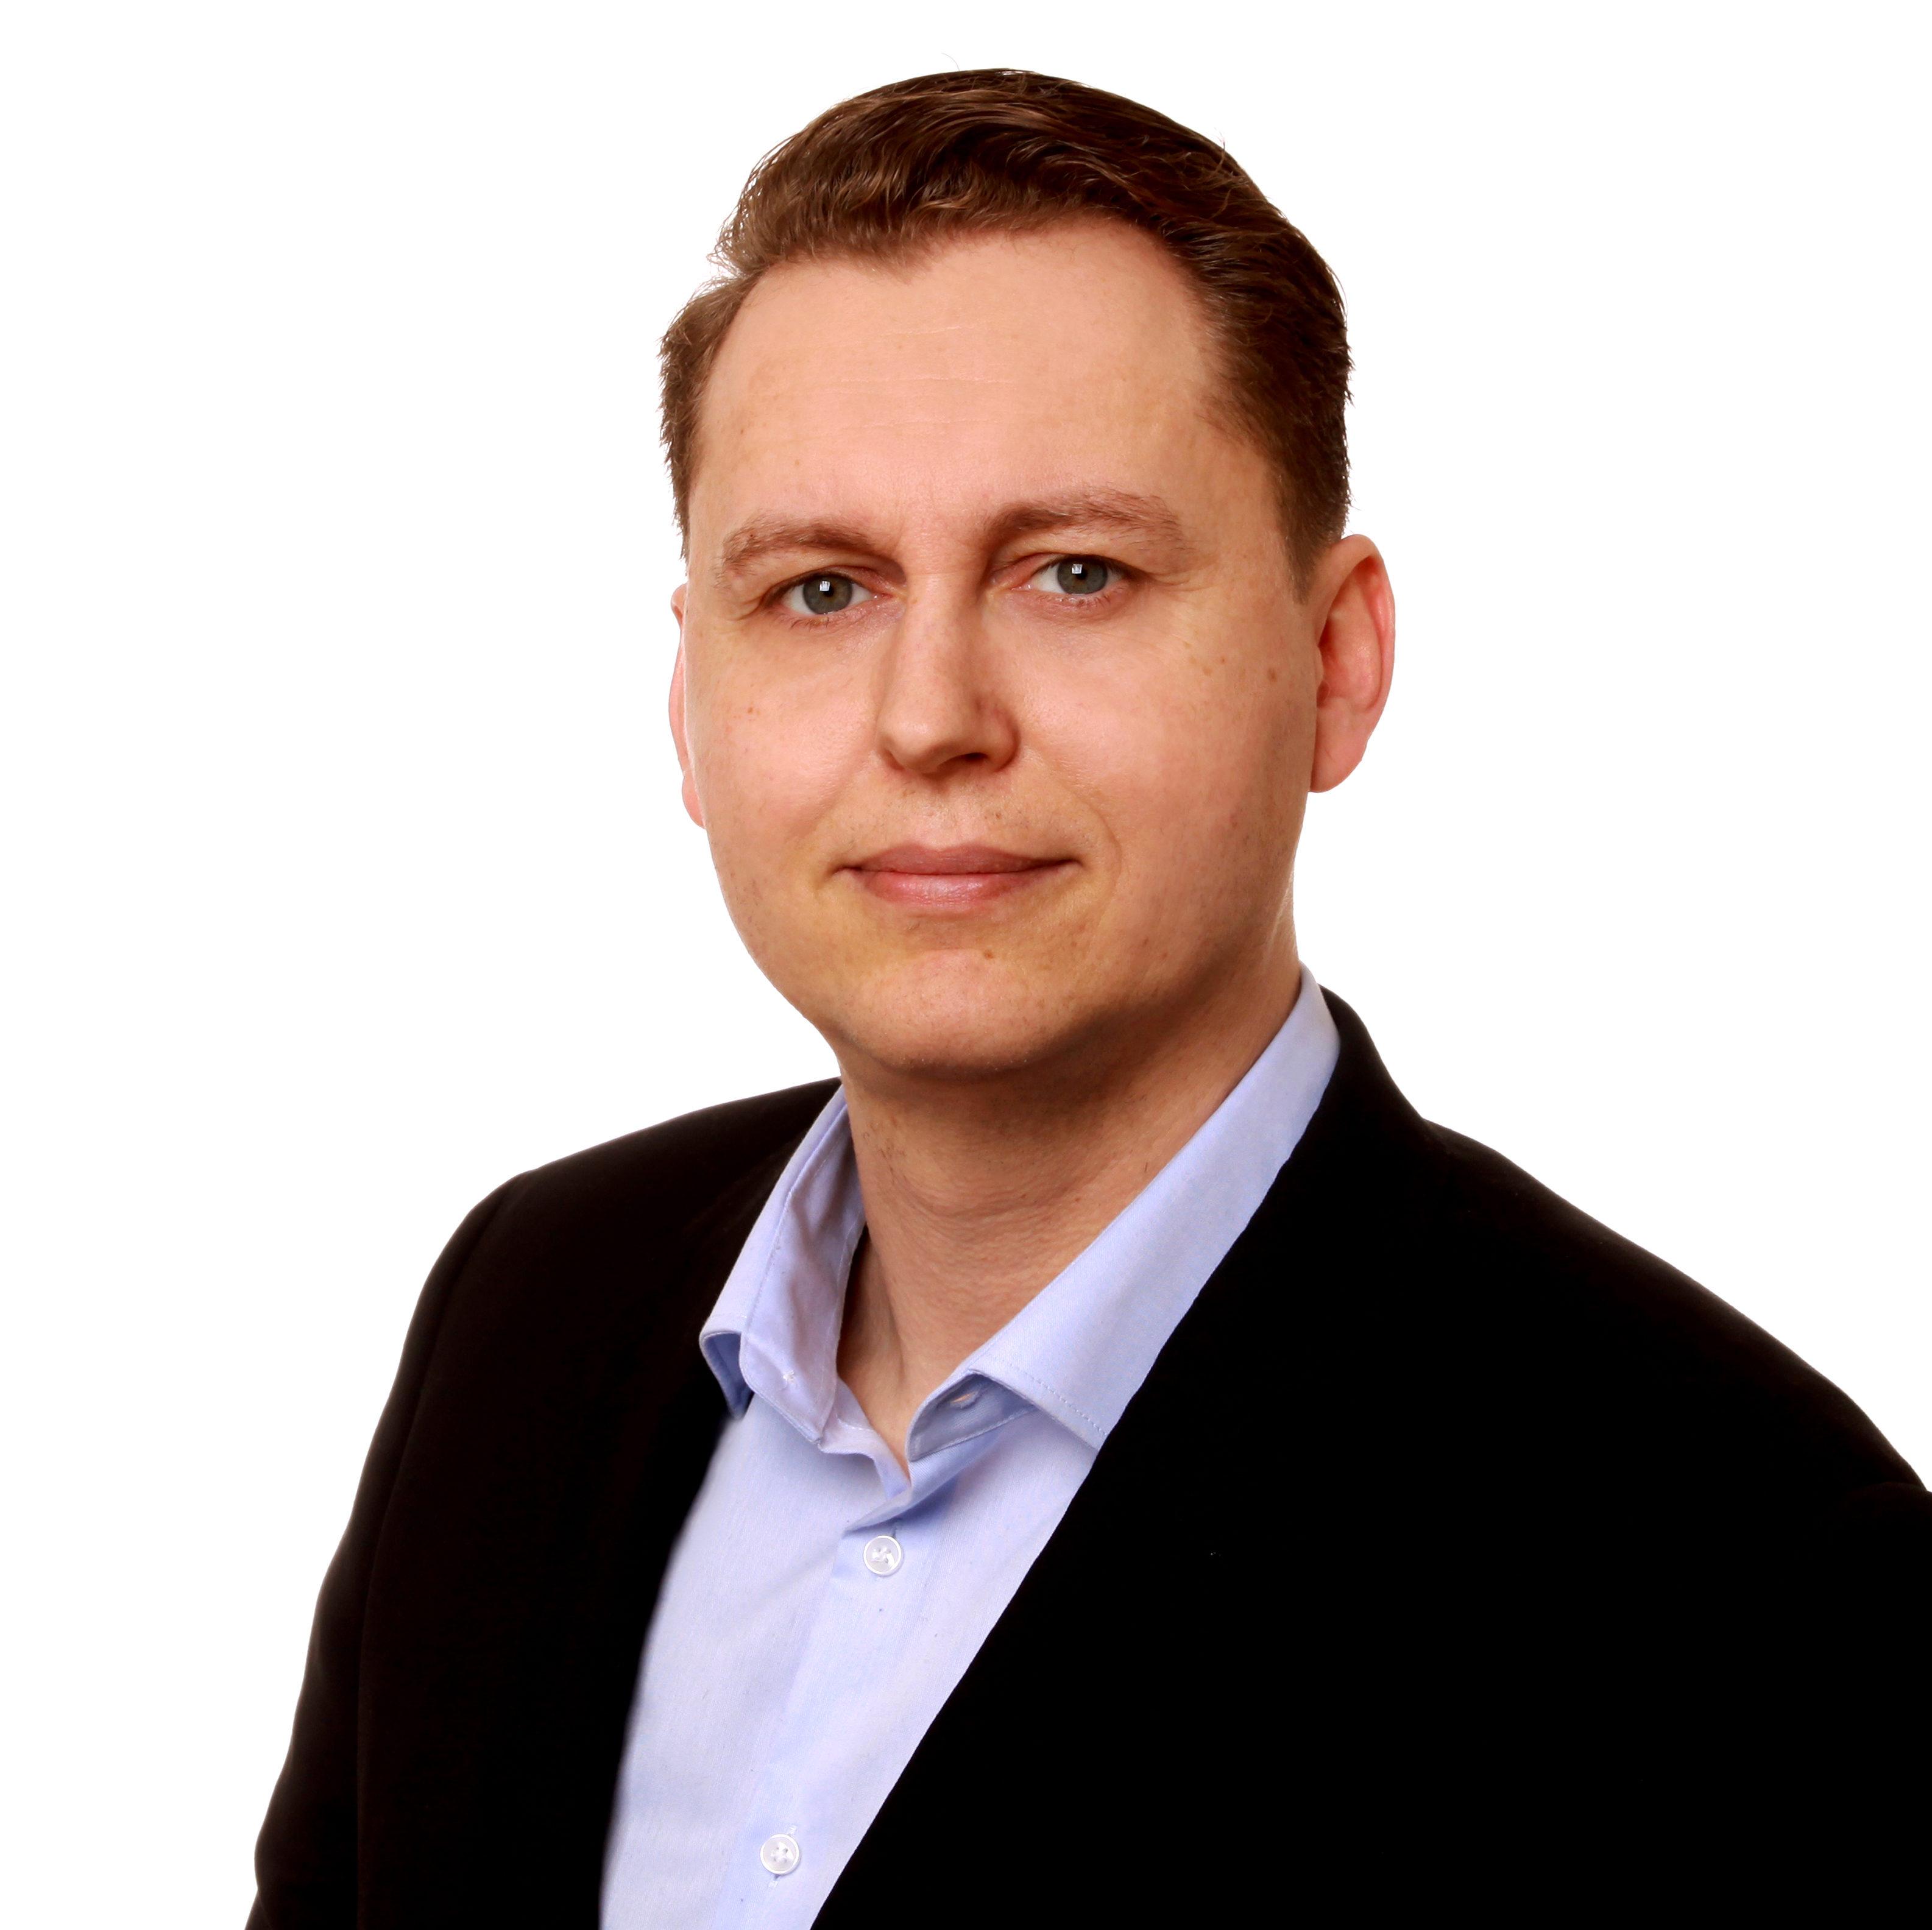 Dr. Oliver Schönherr